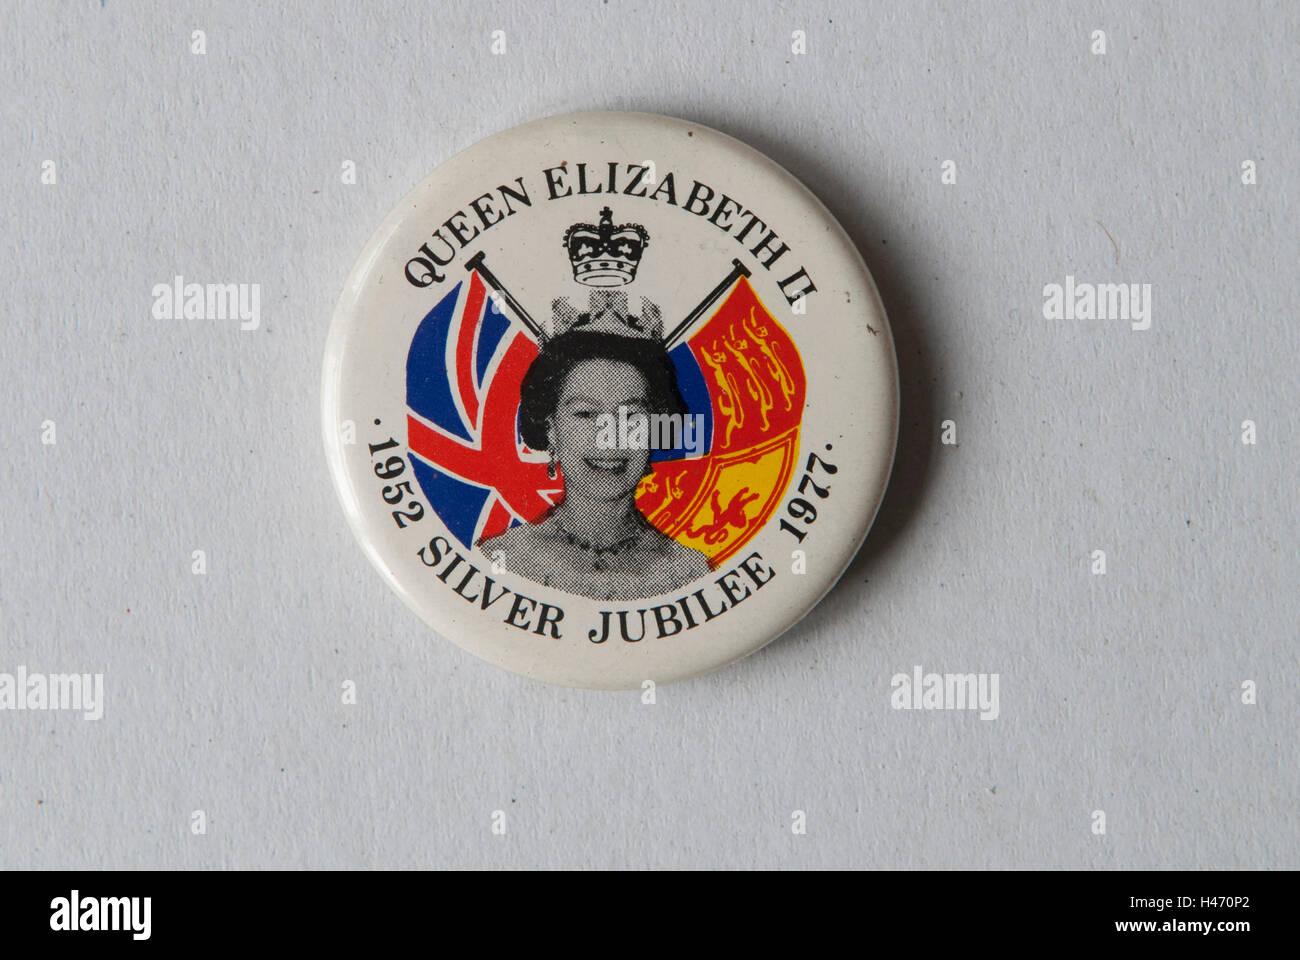 Queen Elizabeth II 1952 Silver Jubilee 1977 button badge HOMER SYKES - Stock Image